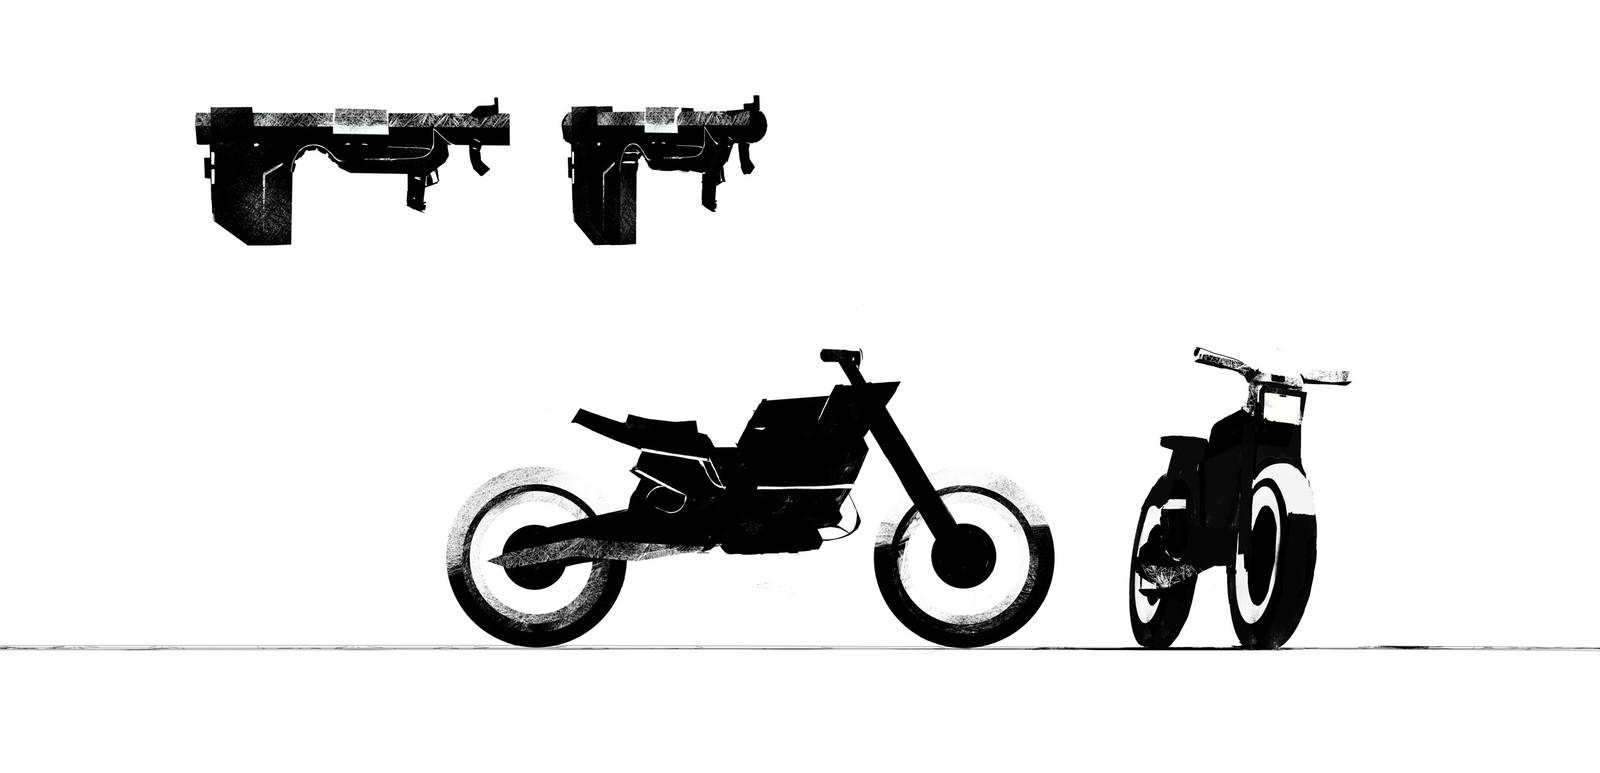 A truck, a motorbike, a girl, a bazooka and a tank.